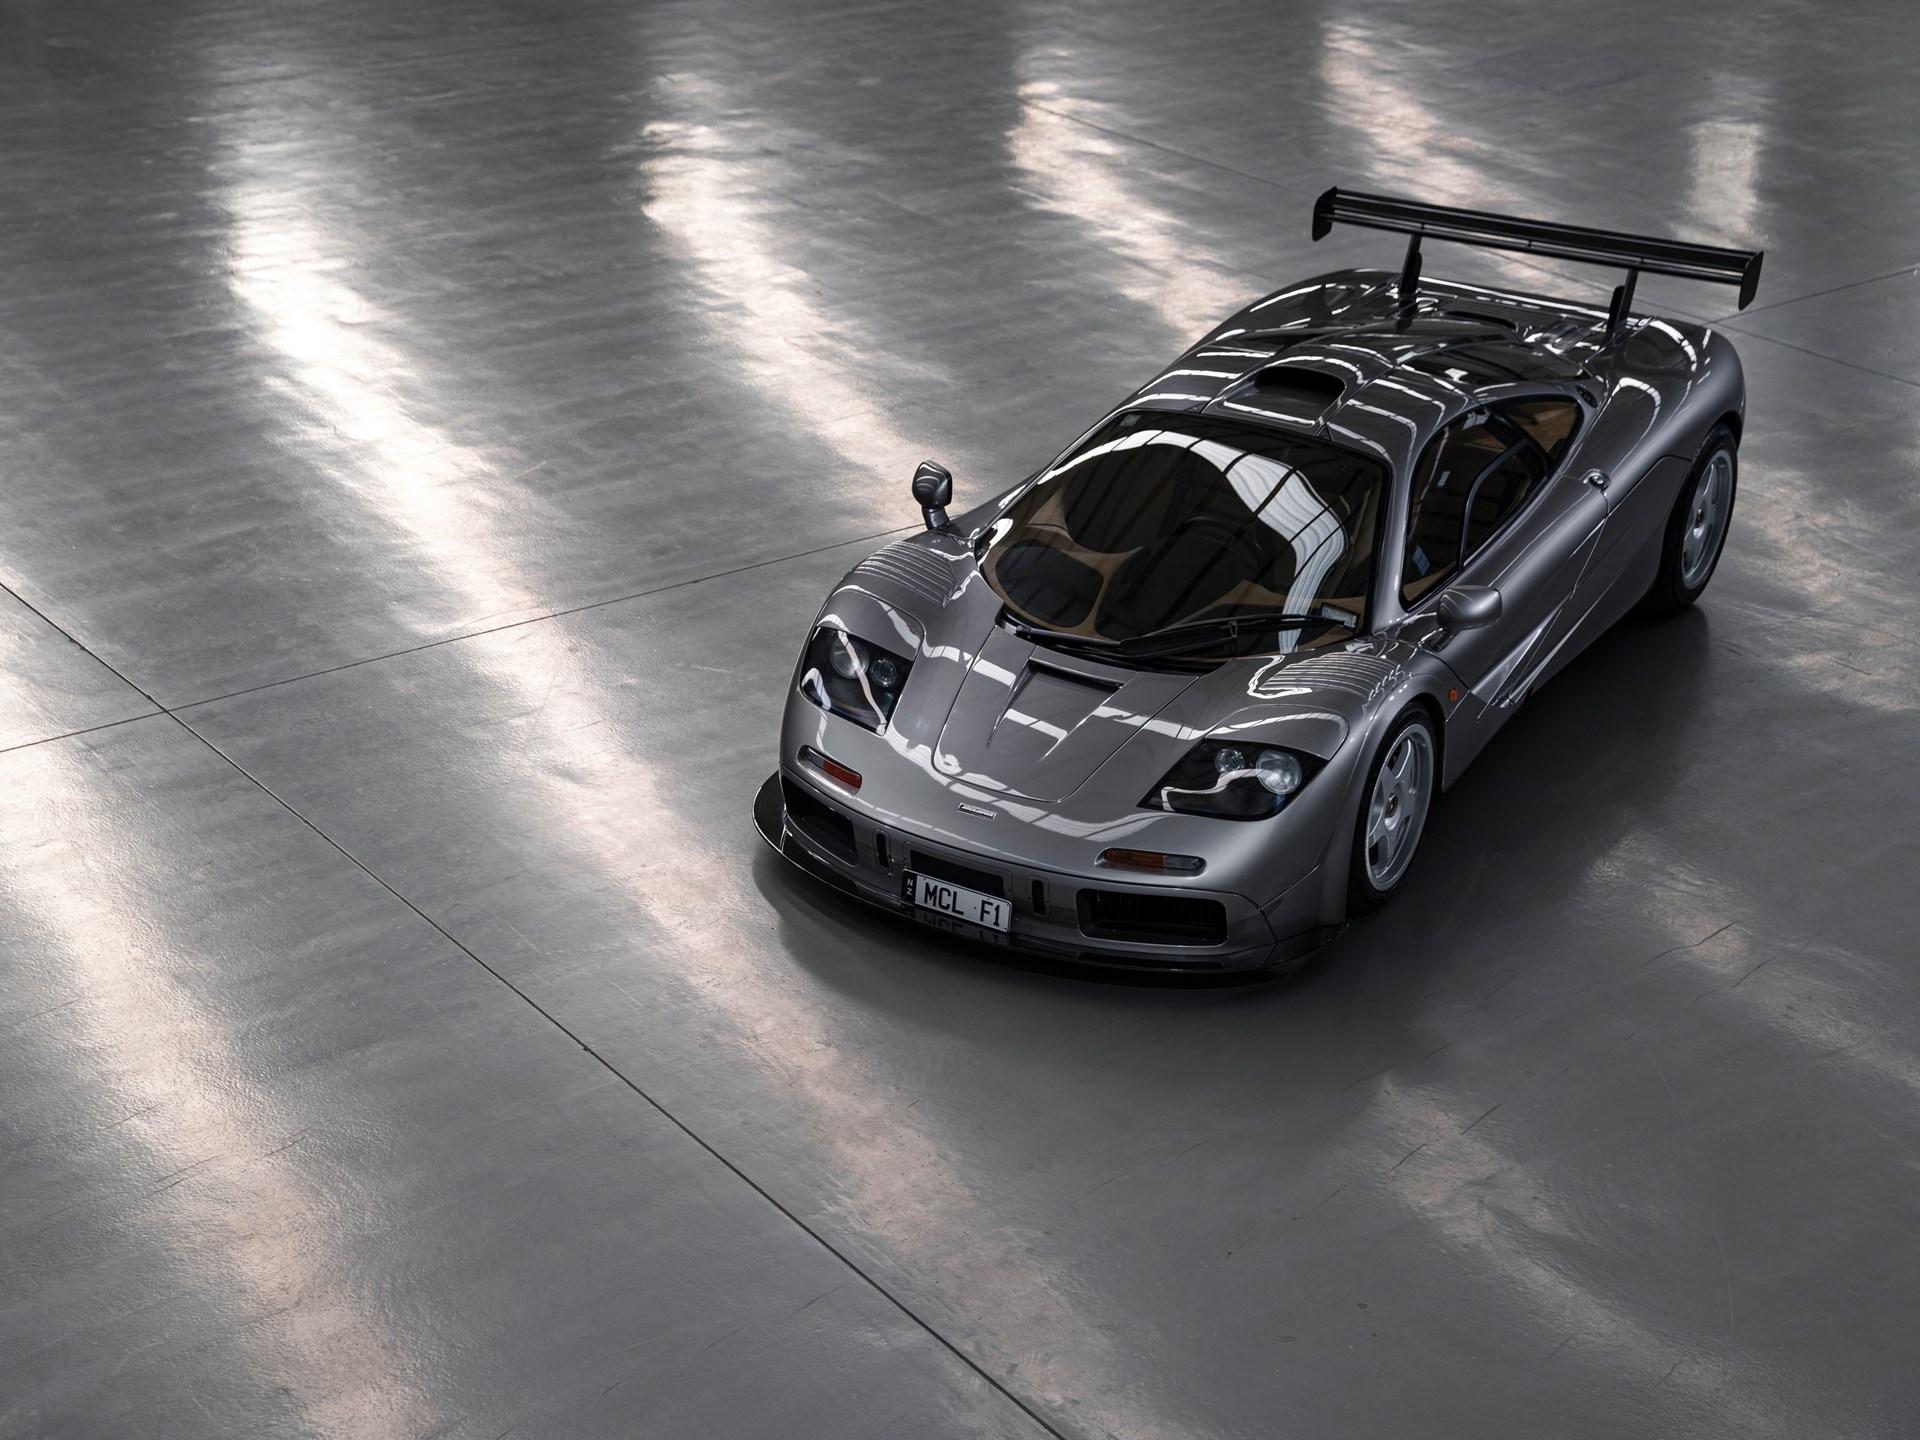 1994 McLaren F1 'LM-Specification' overhead